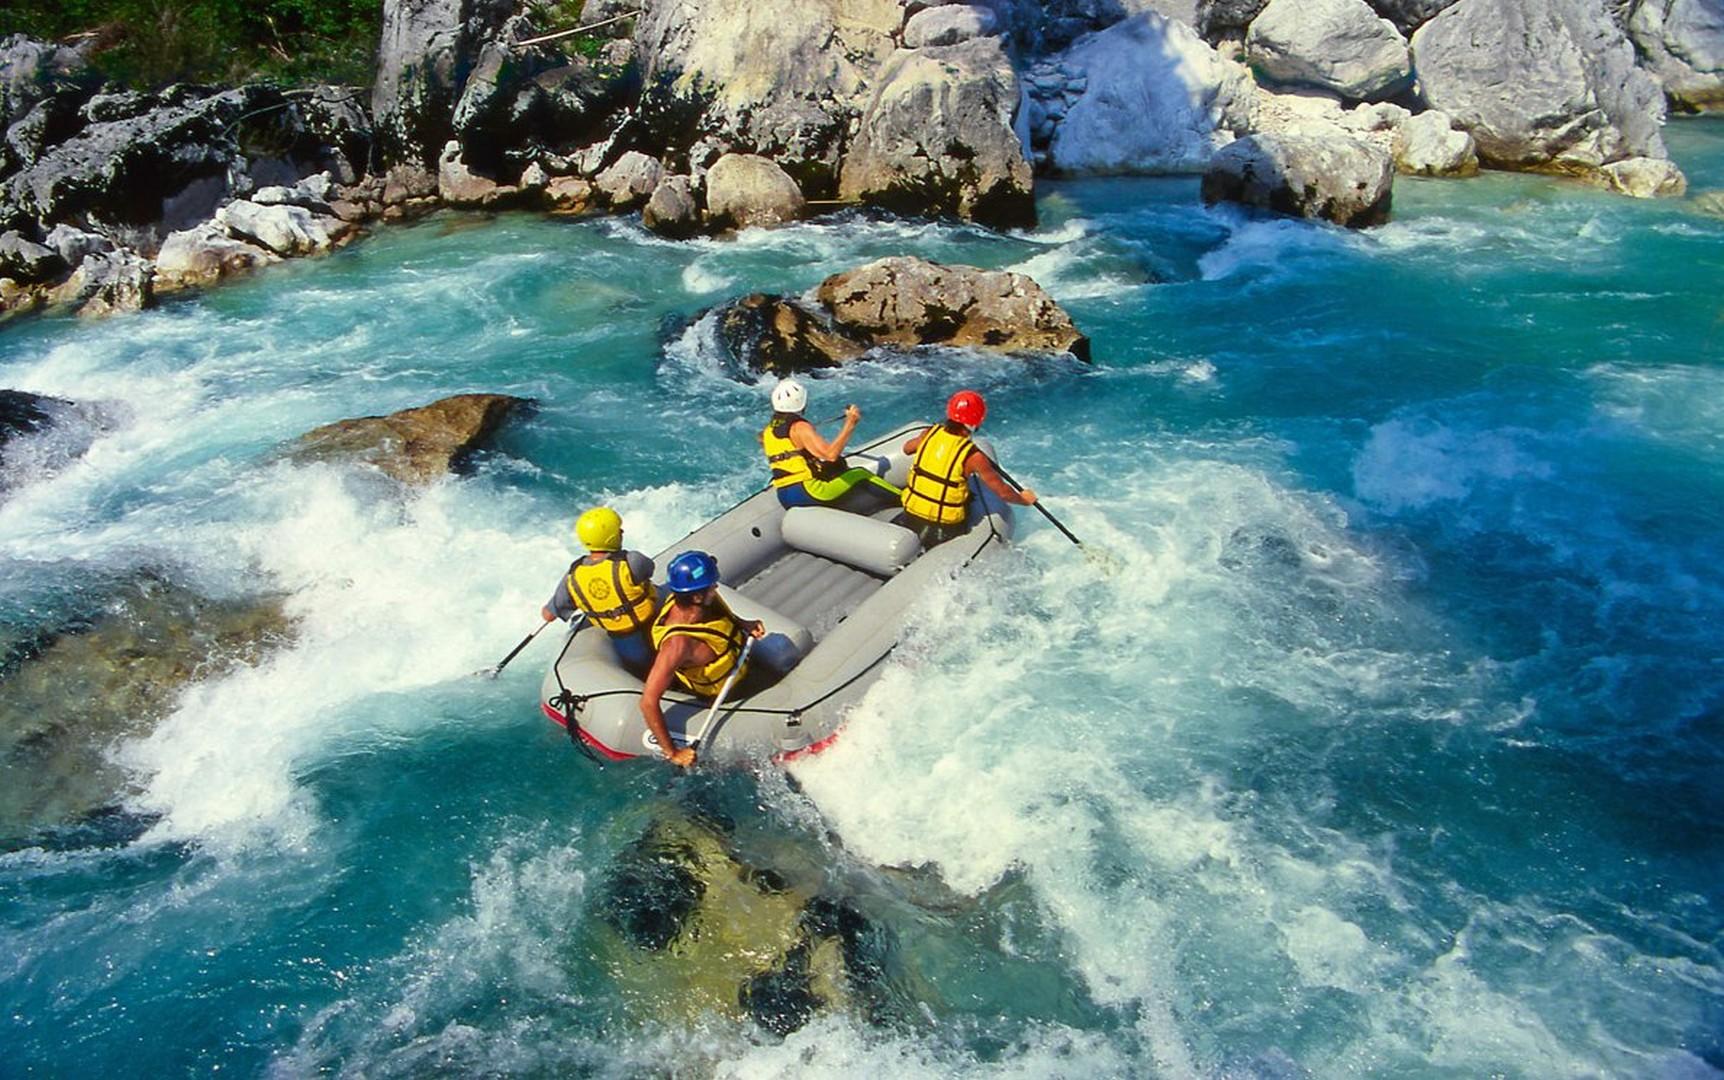 White Water Rafting Wallpaper 25   1724 X 1080 stmednet 1724x1080